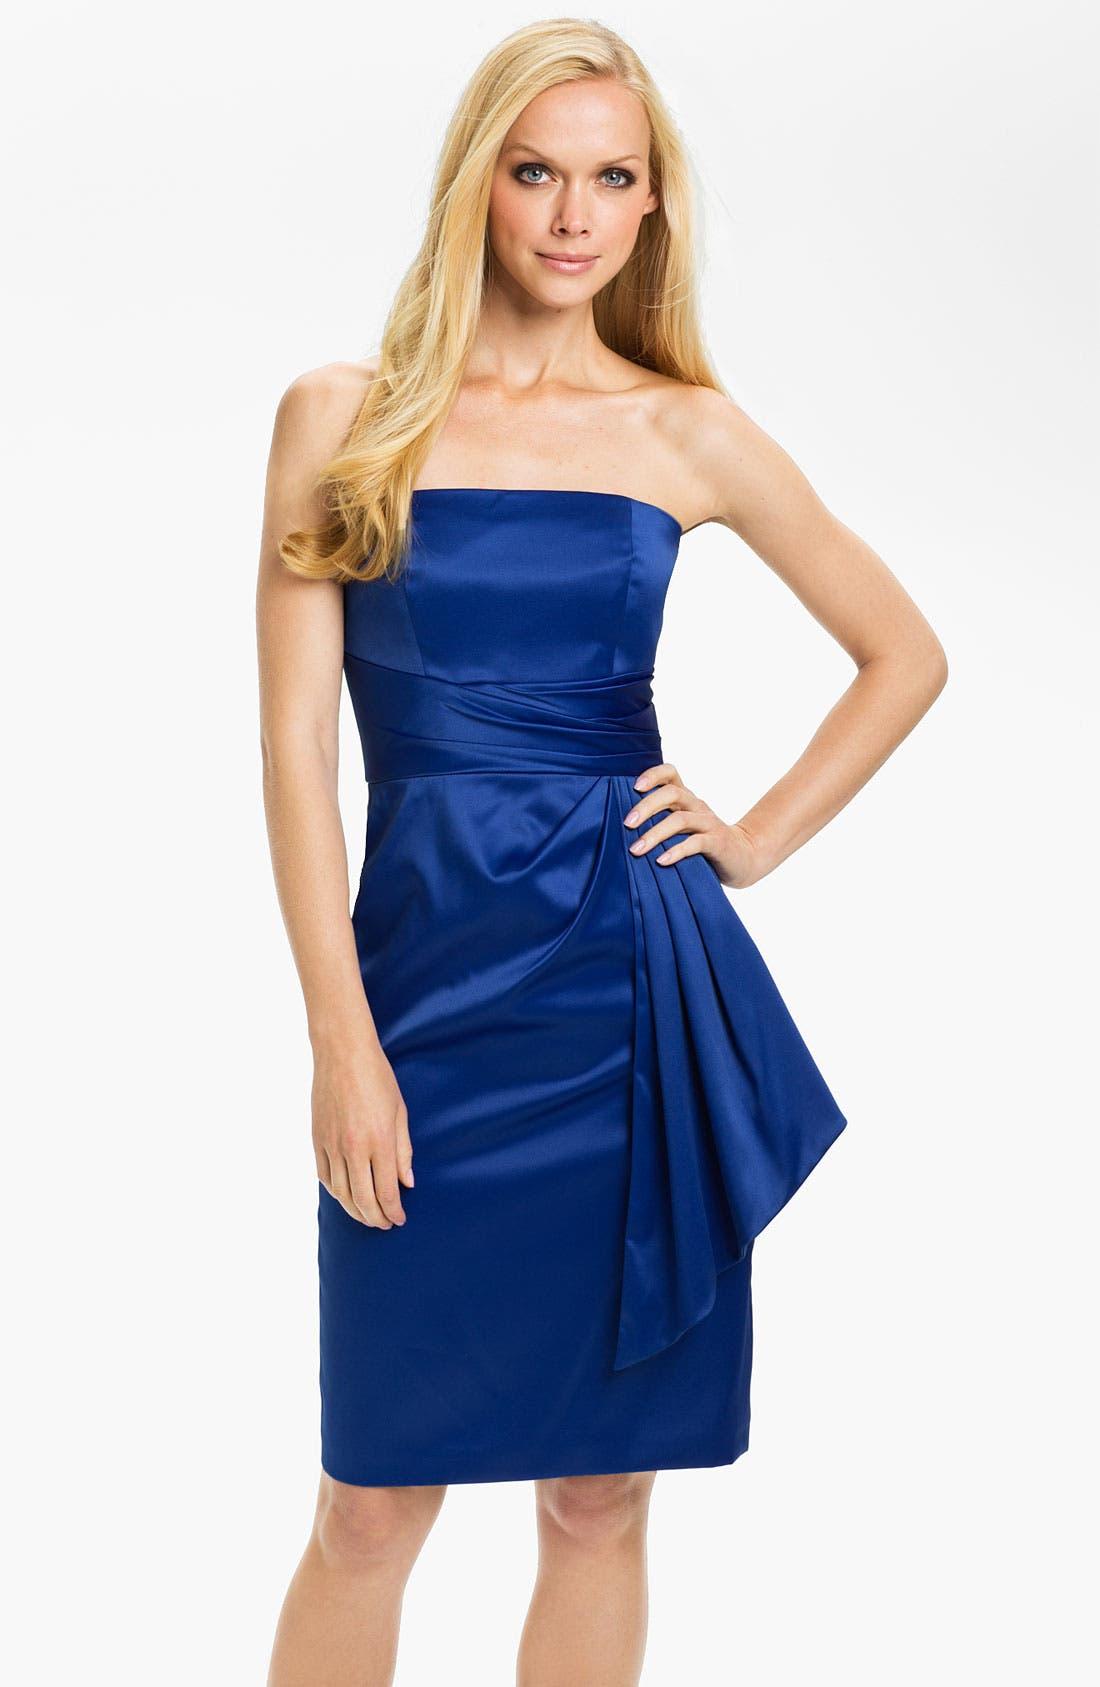 Alternate Image 1 Selected - ML Monique Lhuillier Bridesmaids Strapless Side Pleat Dress (Nordstrom Exclusive)